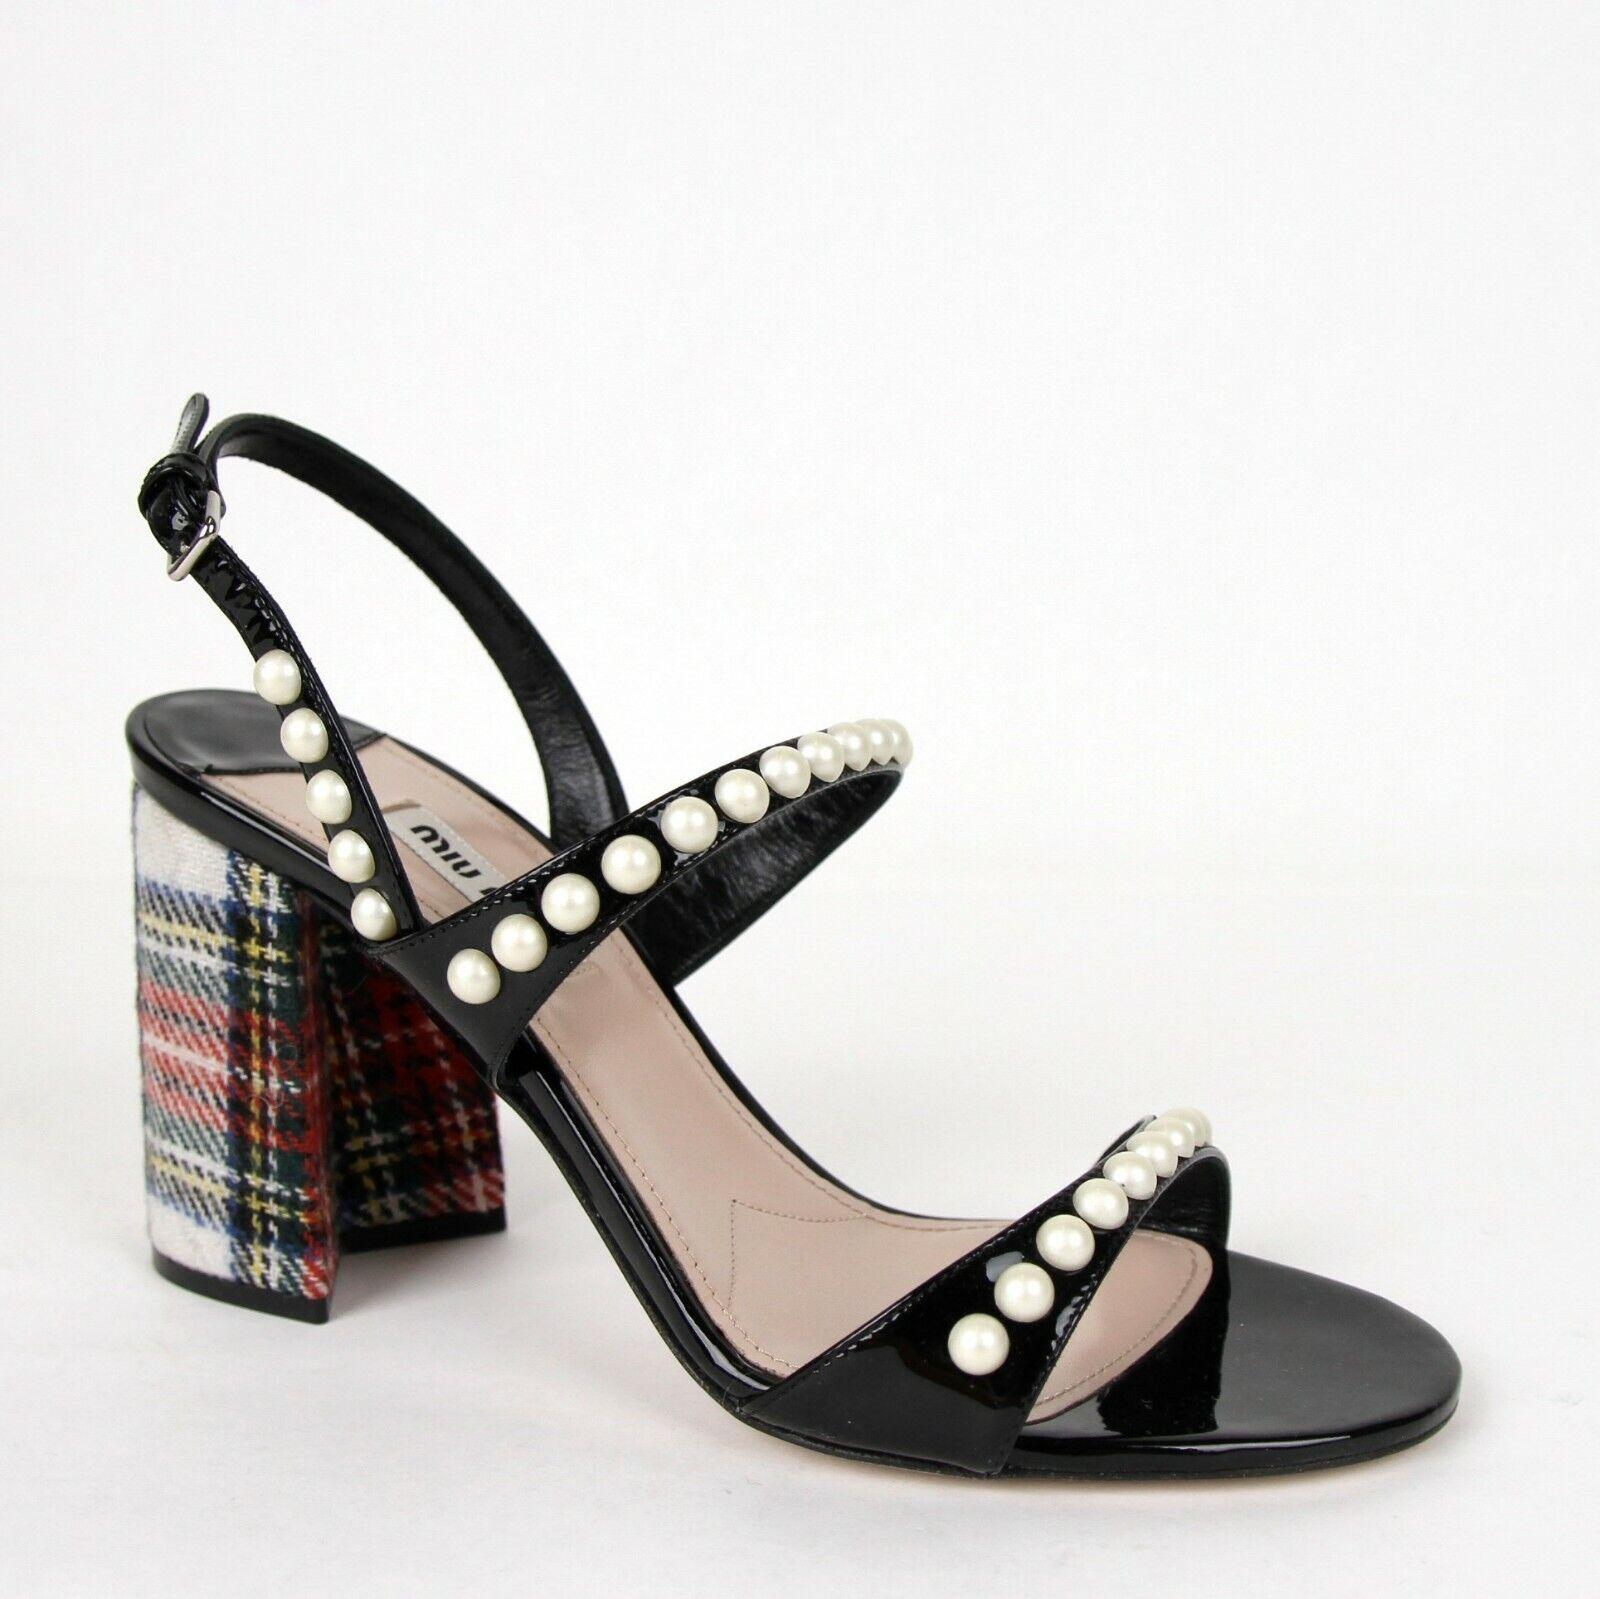 Miu Miu Damen Schwarzes Lackleder Sandalen mit Perle 38  US 8 5X142B